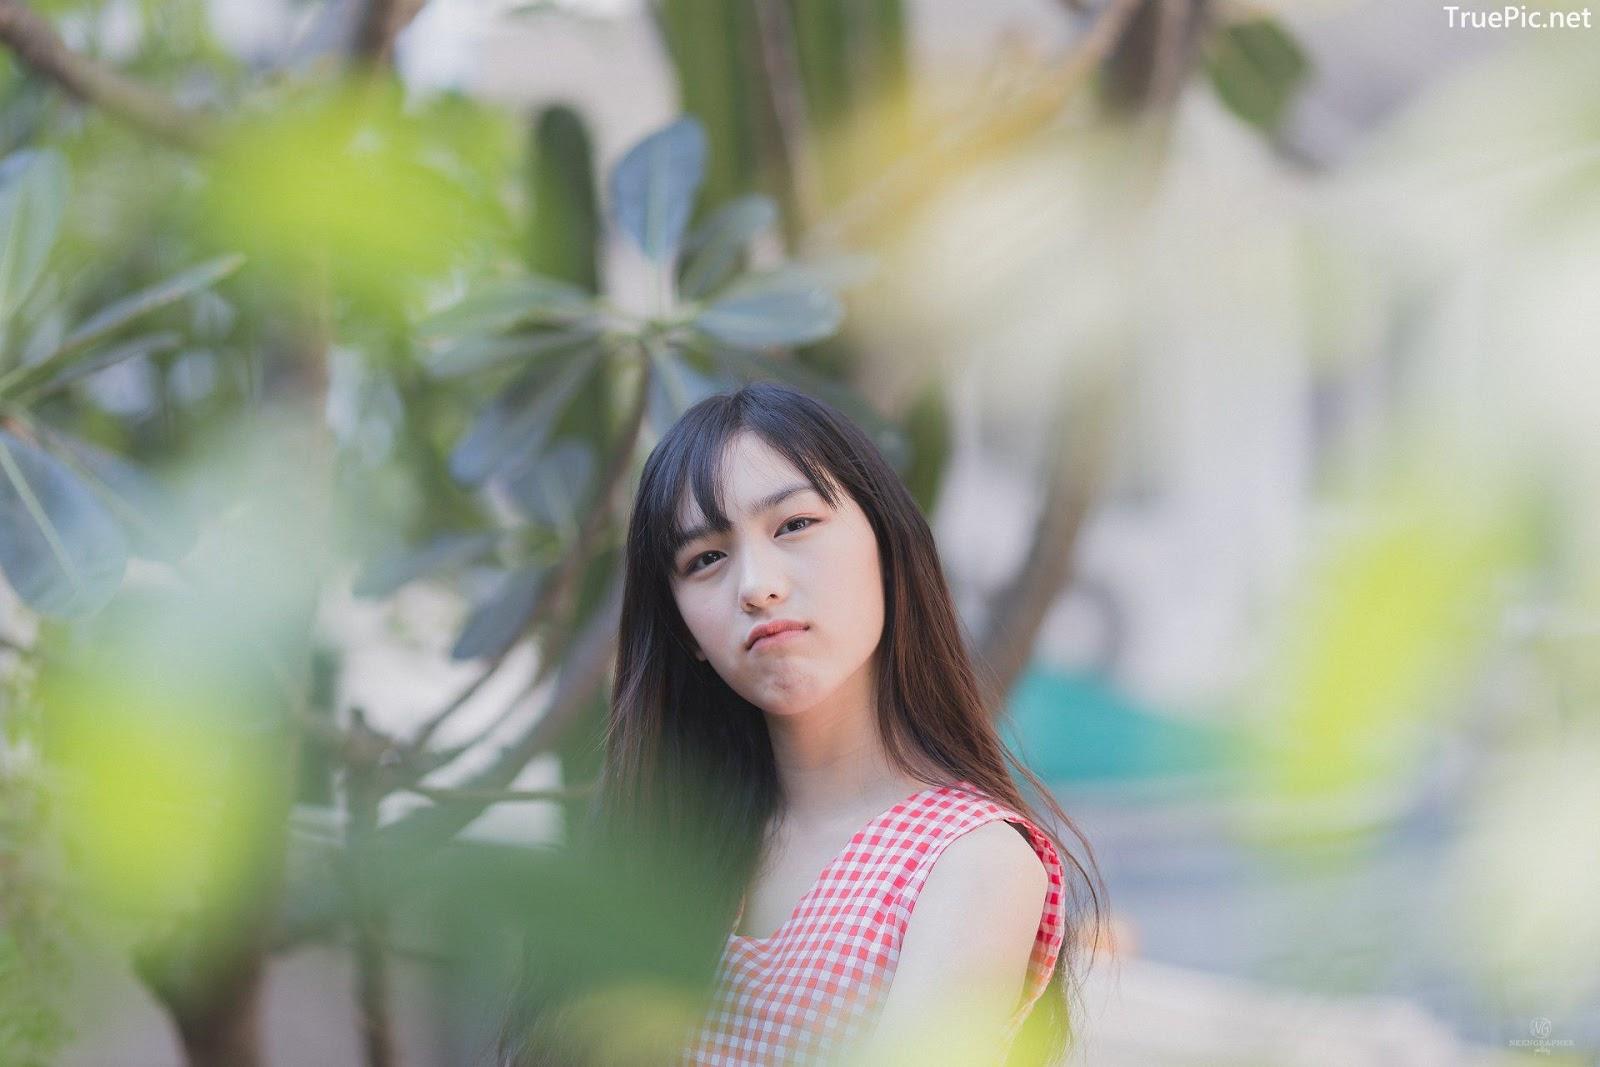 Image-Thailand-Cute-Model-Emma-Panisara–Album-Emma-Bright-Sunday-TruePic.net- Picture-29